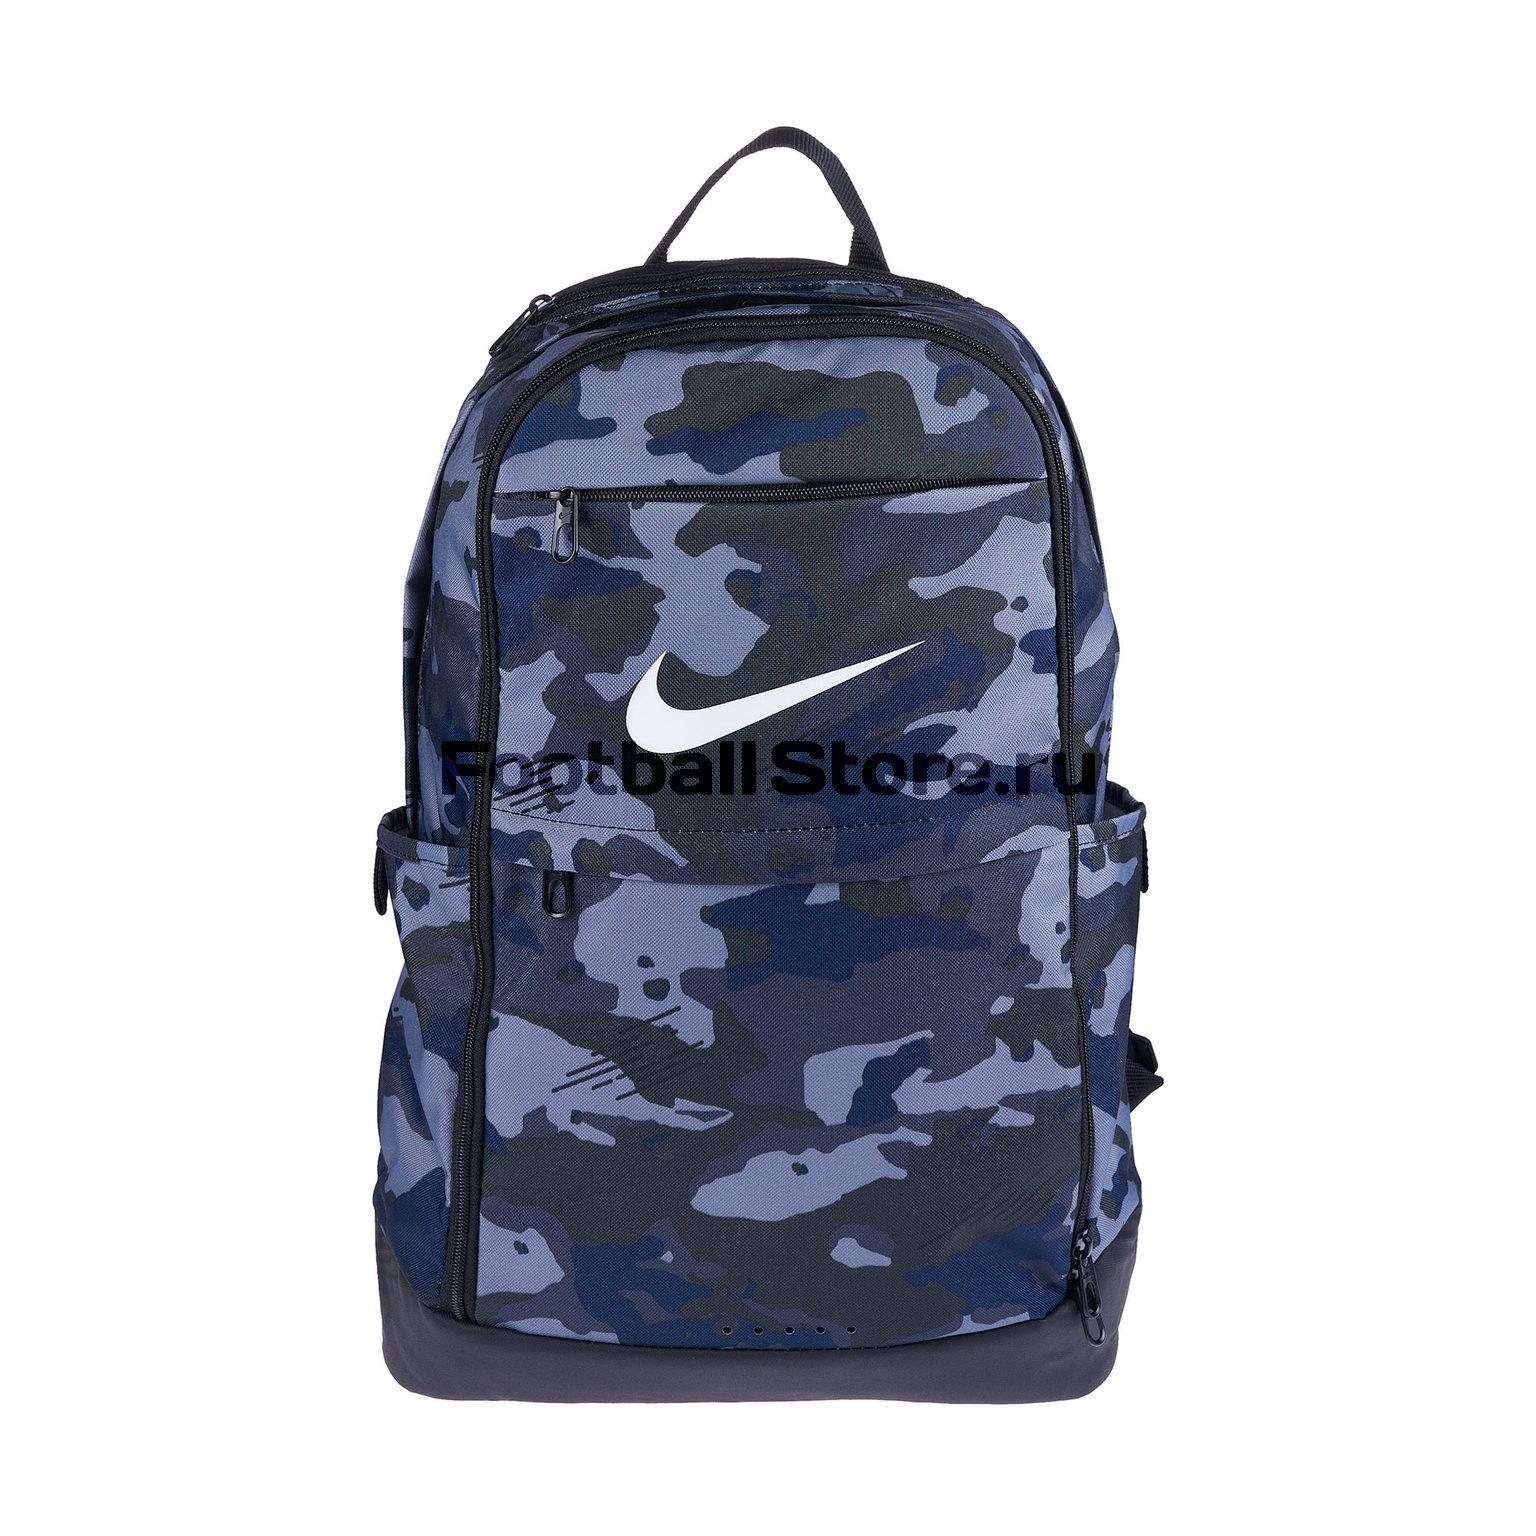 Рюкзак Nike Brasilia BA5893-021 рюкзак детский nike brasilia backpack ba5473 480